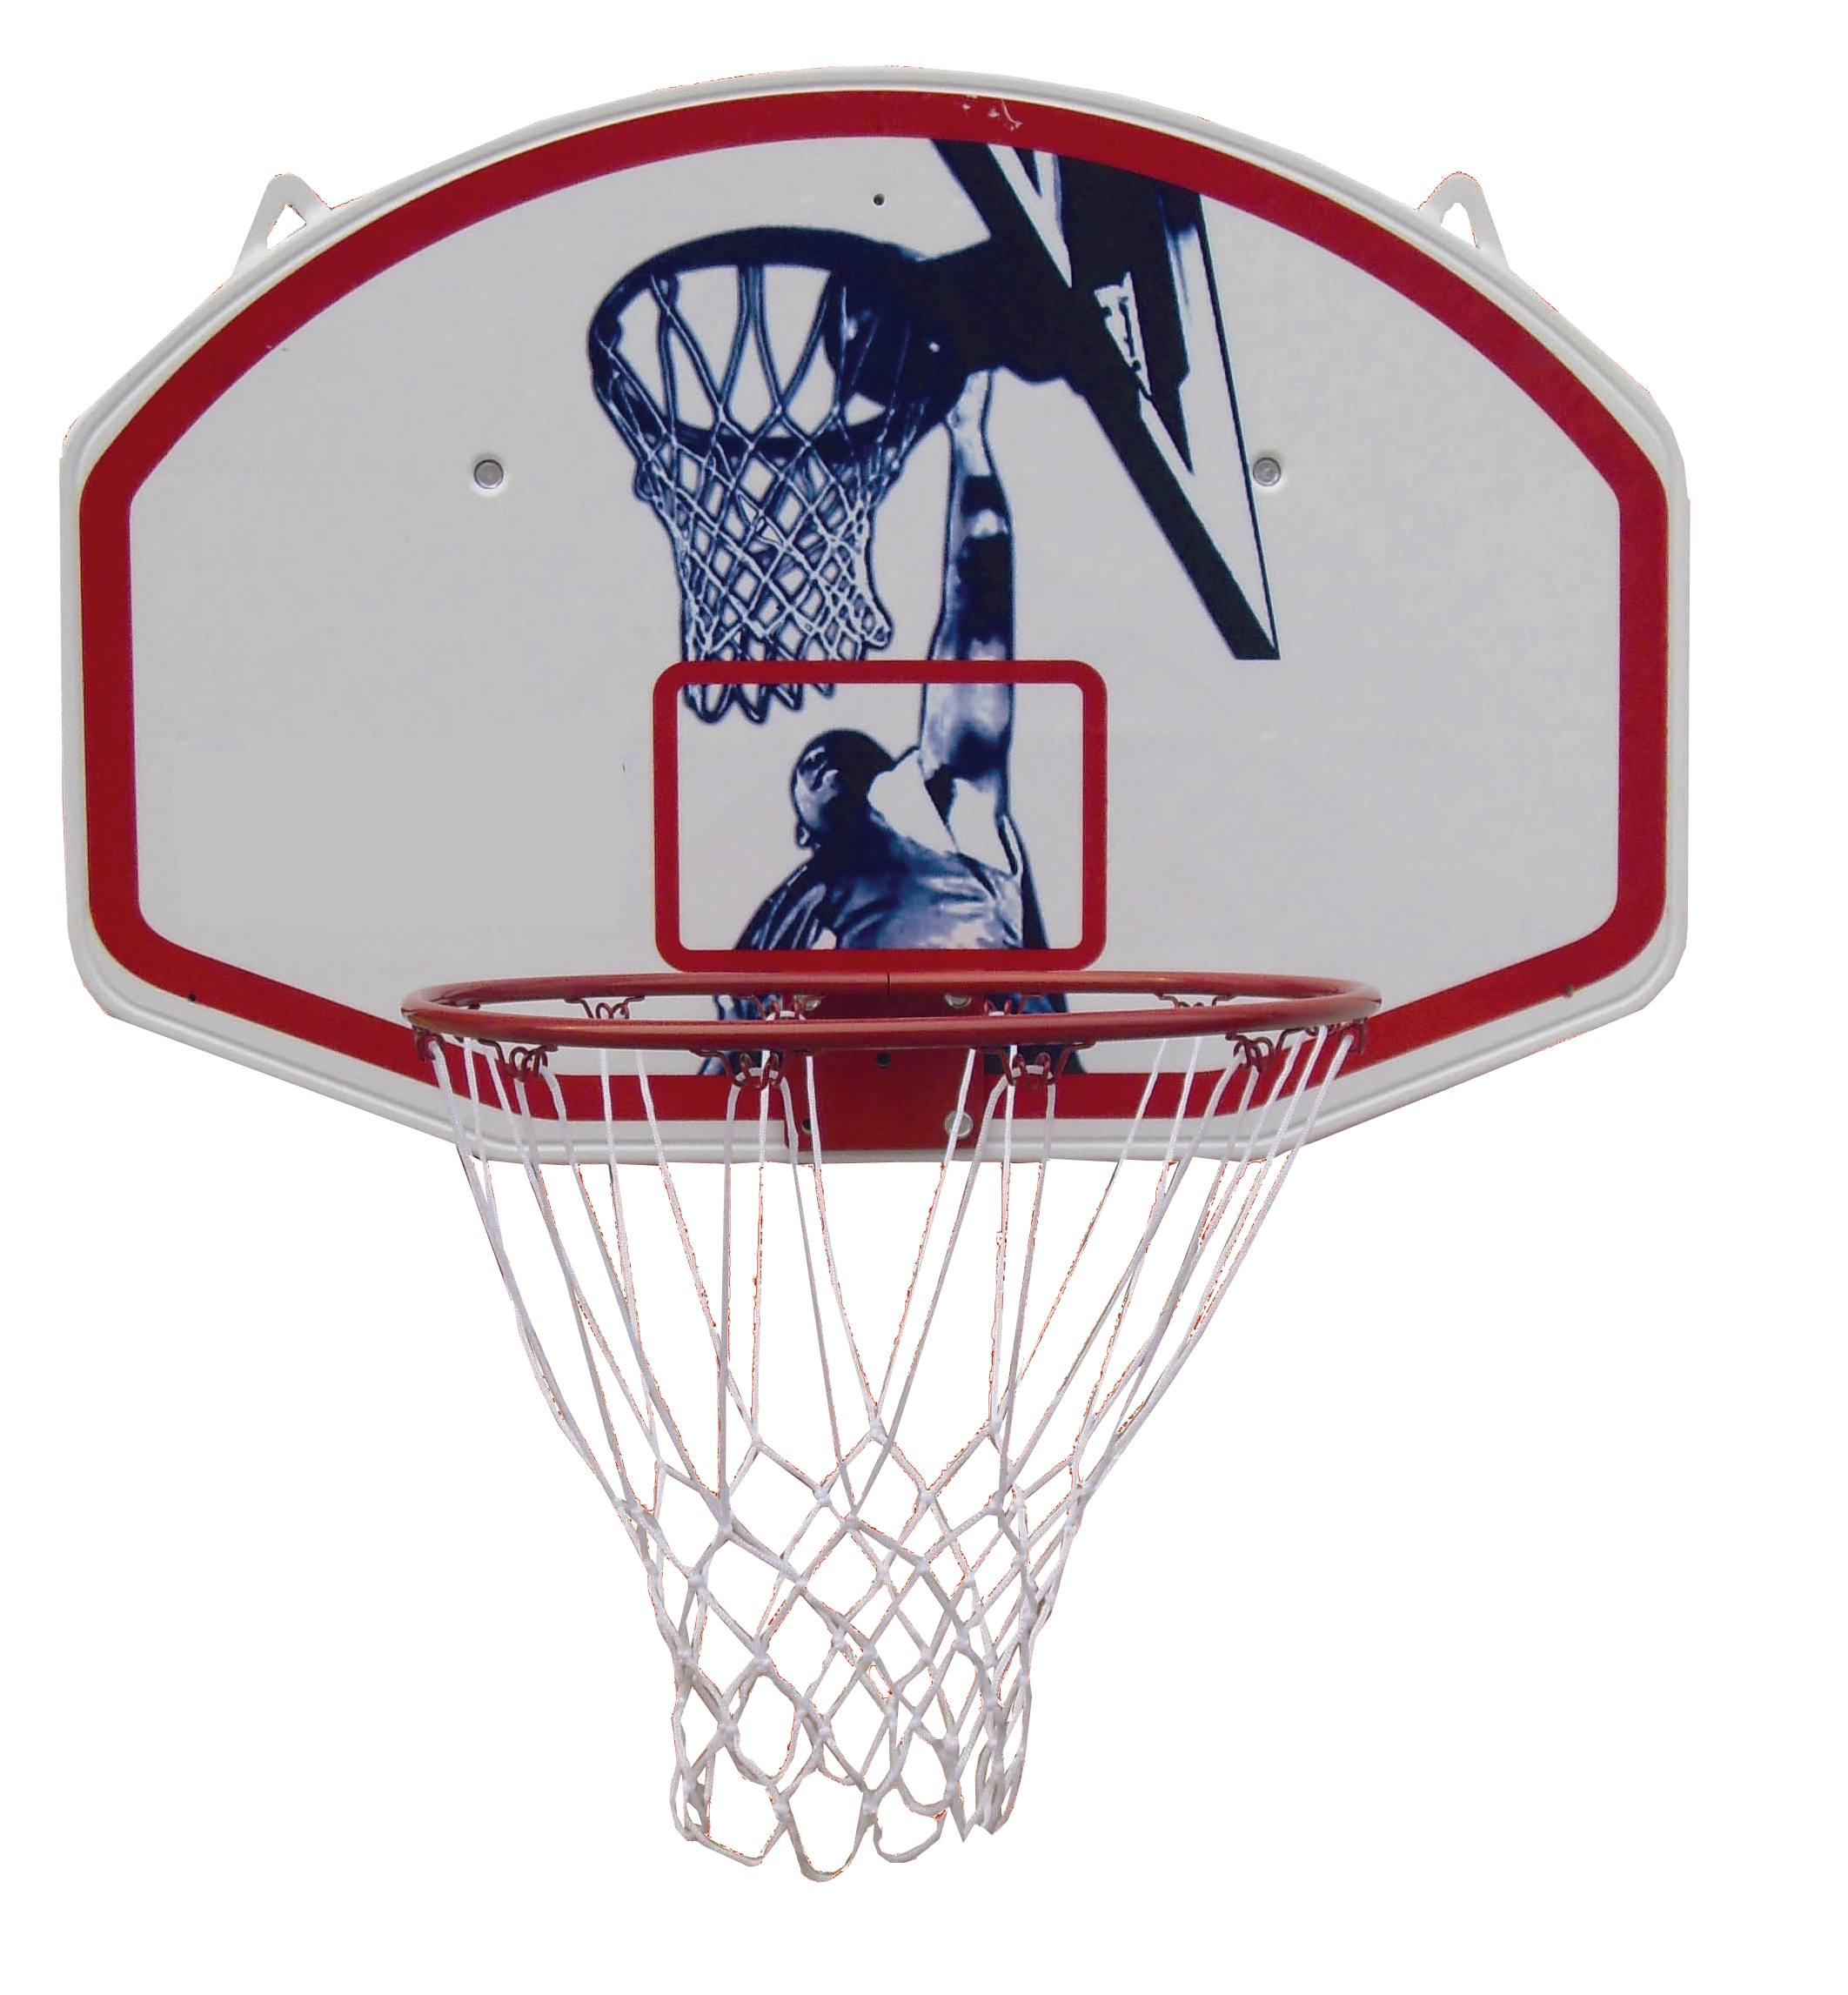 Basketbalová doska + kôš Spartan Ruckwand